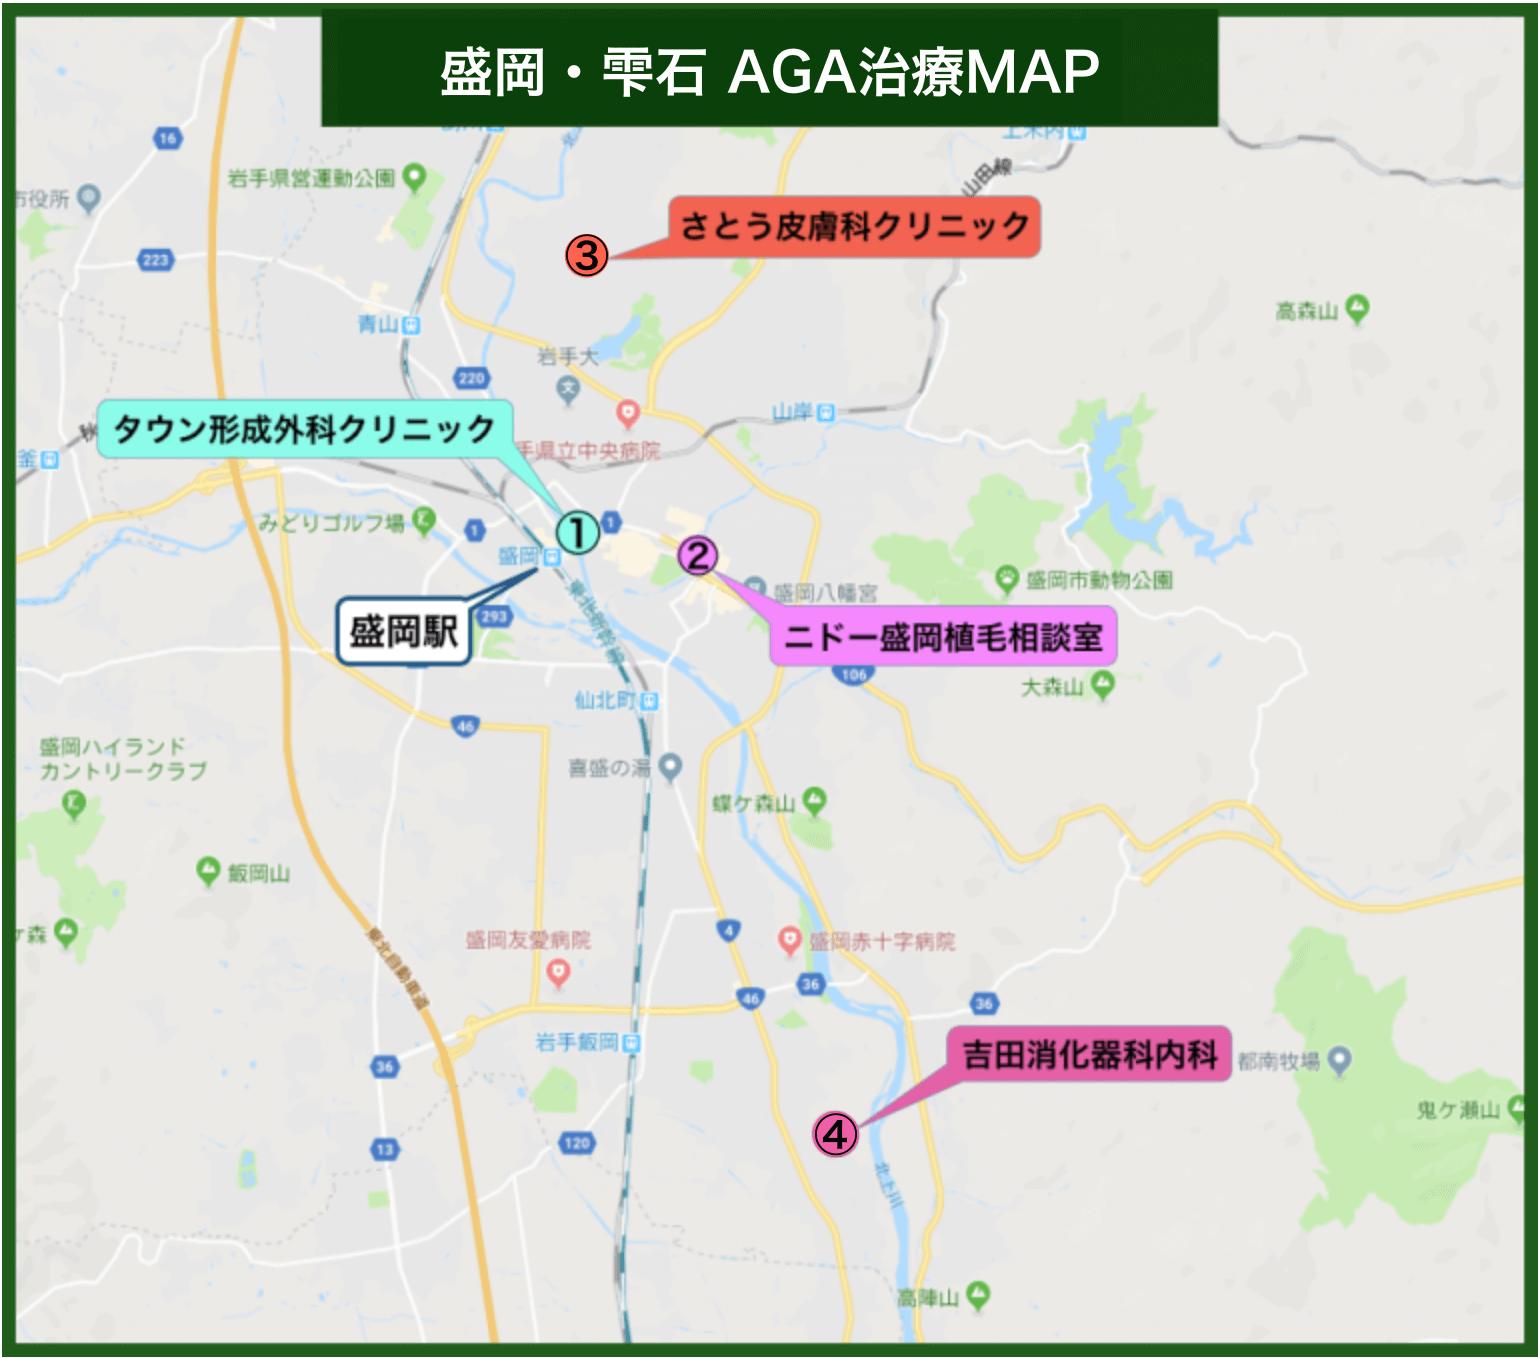 盛岡・雫石 AGA治療MAP